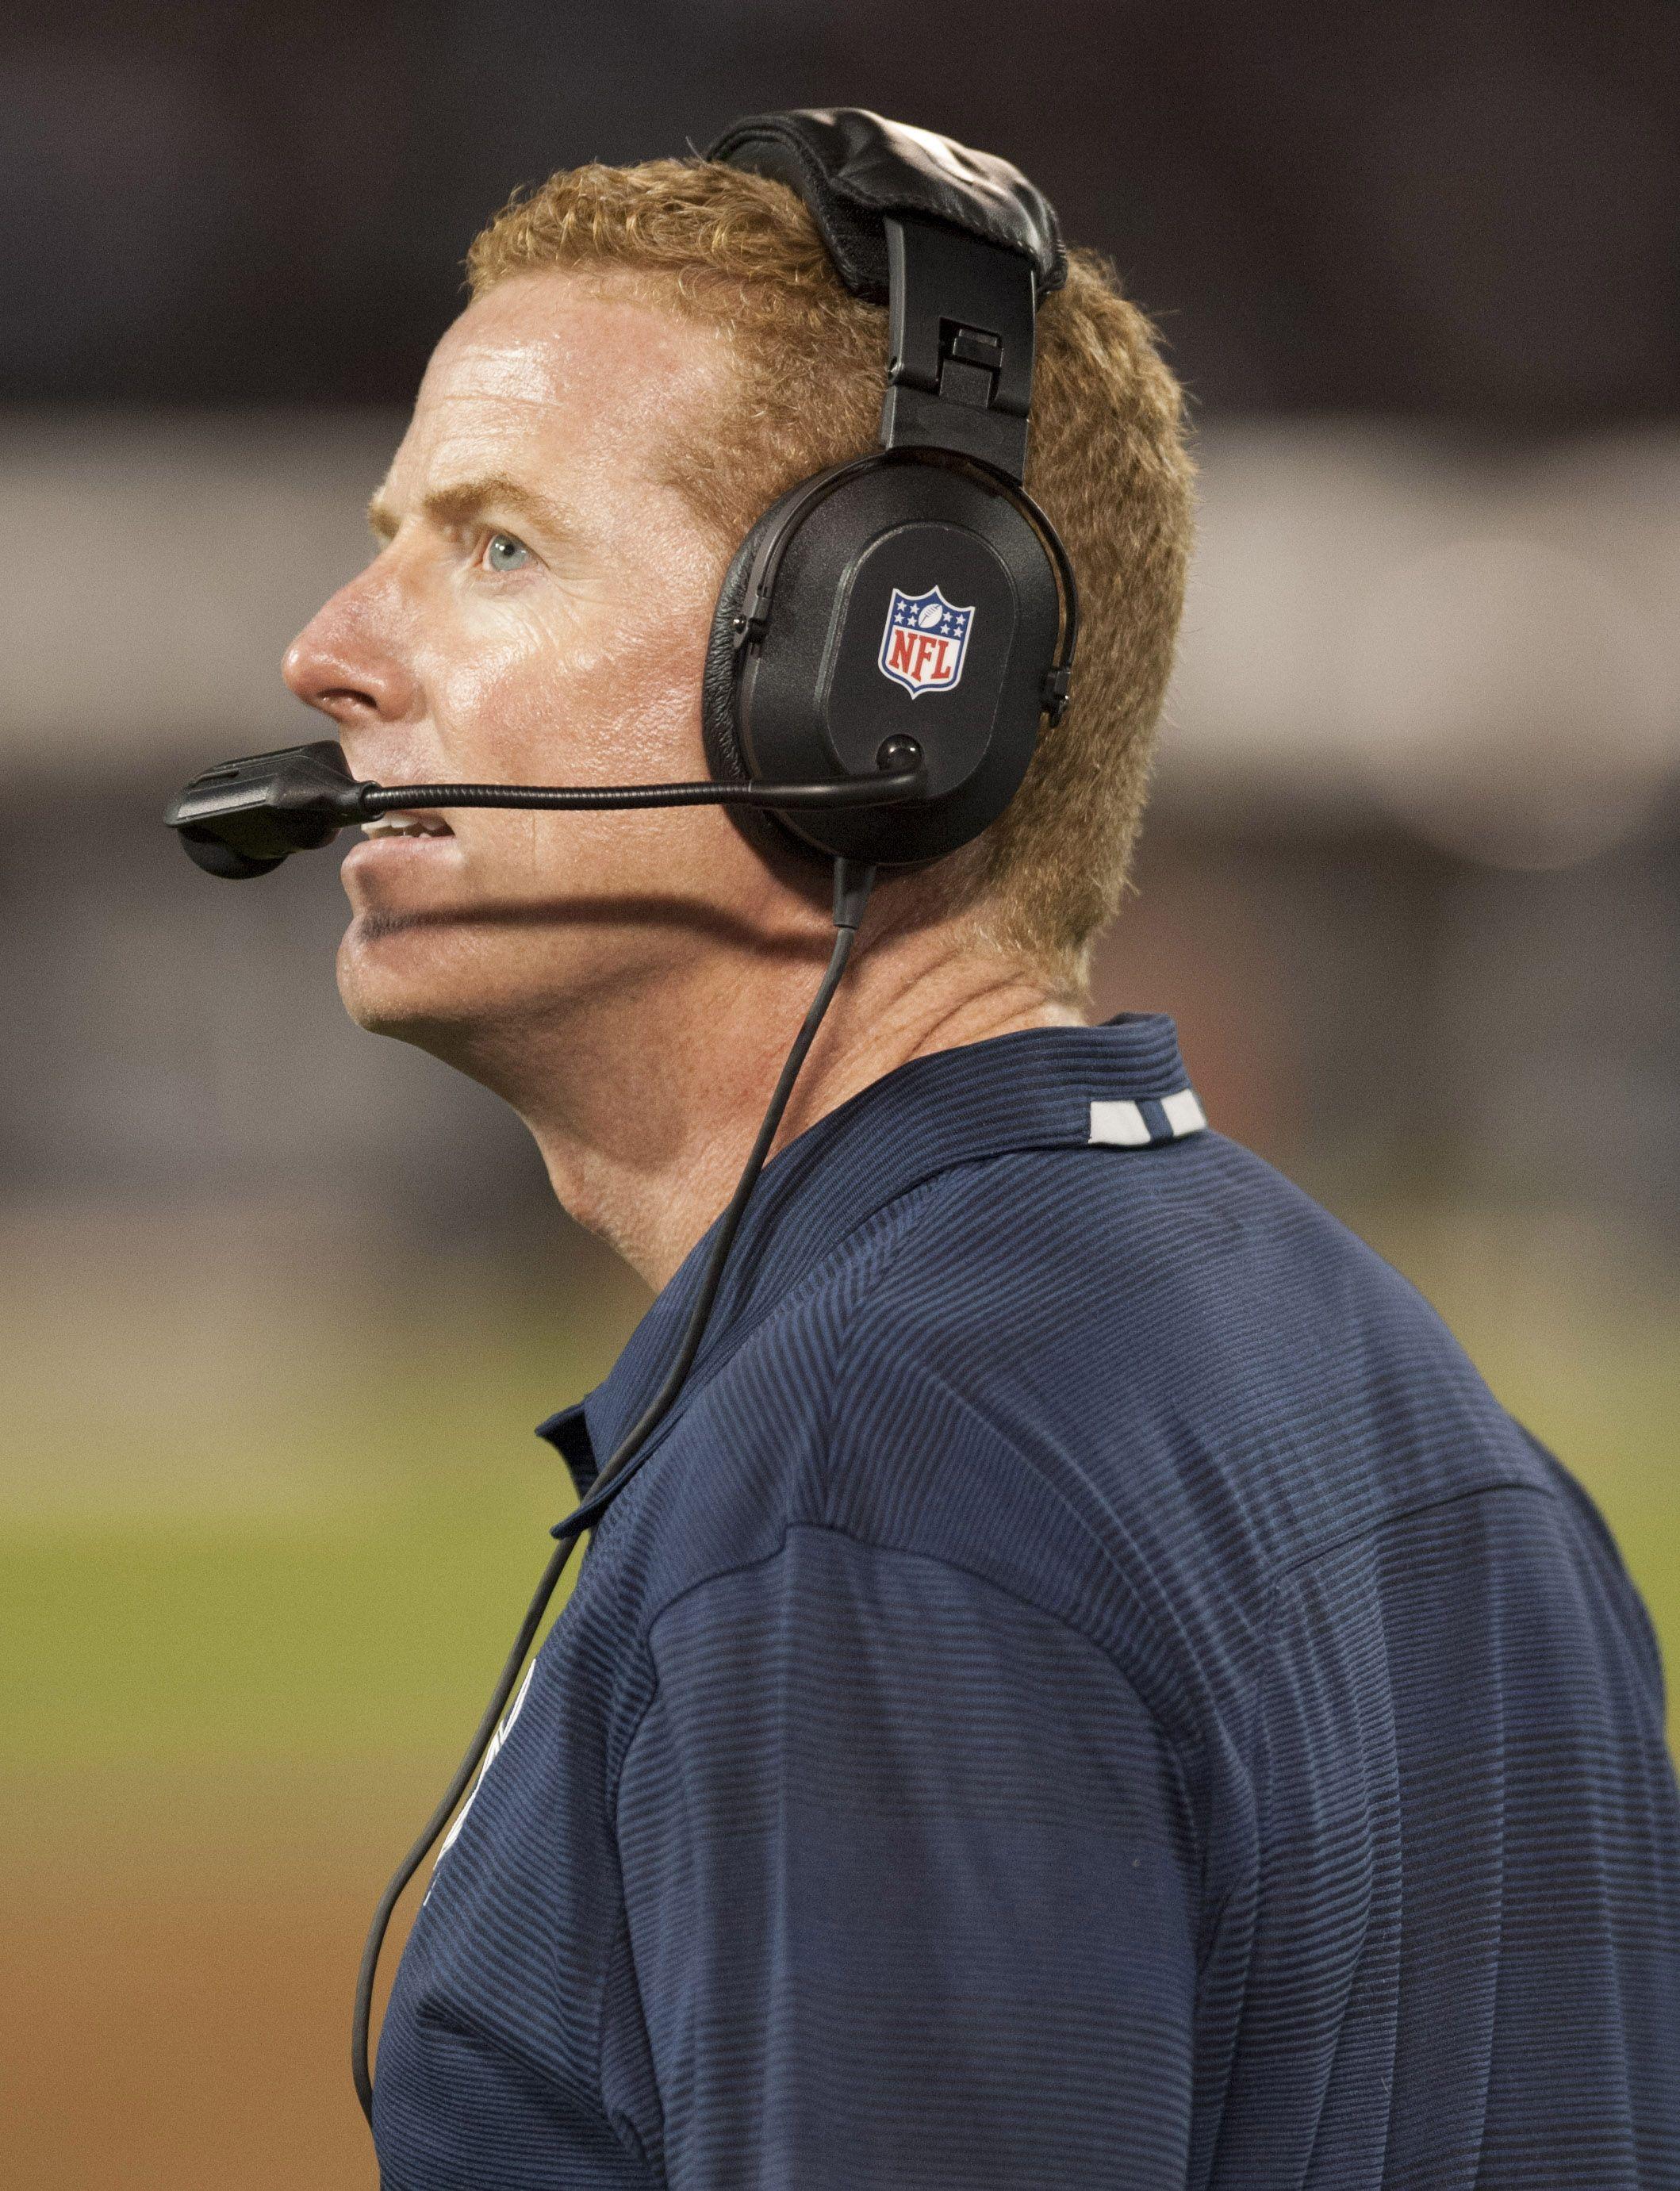 Dallas Cowboys head coach Jason Garrett looks on during